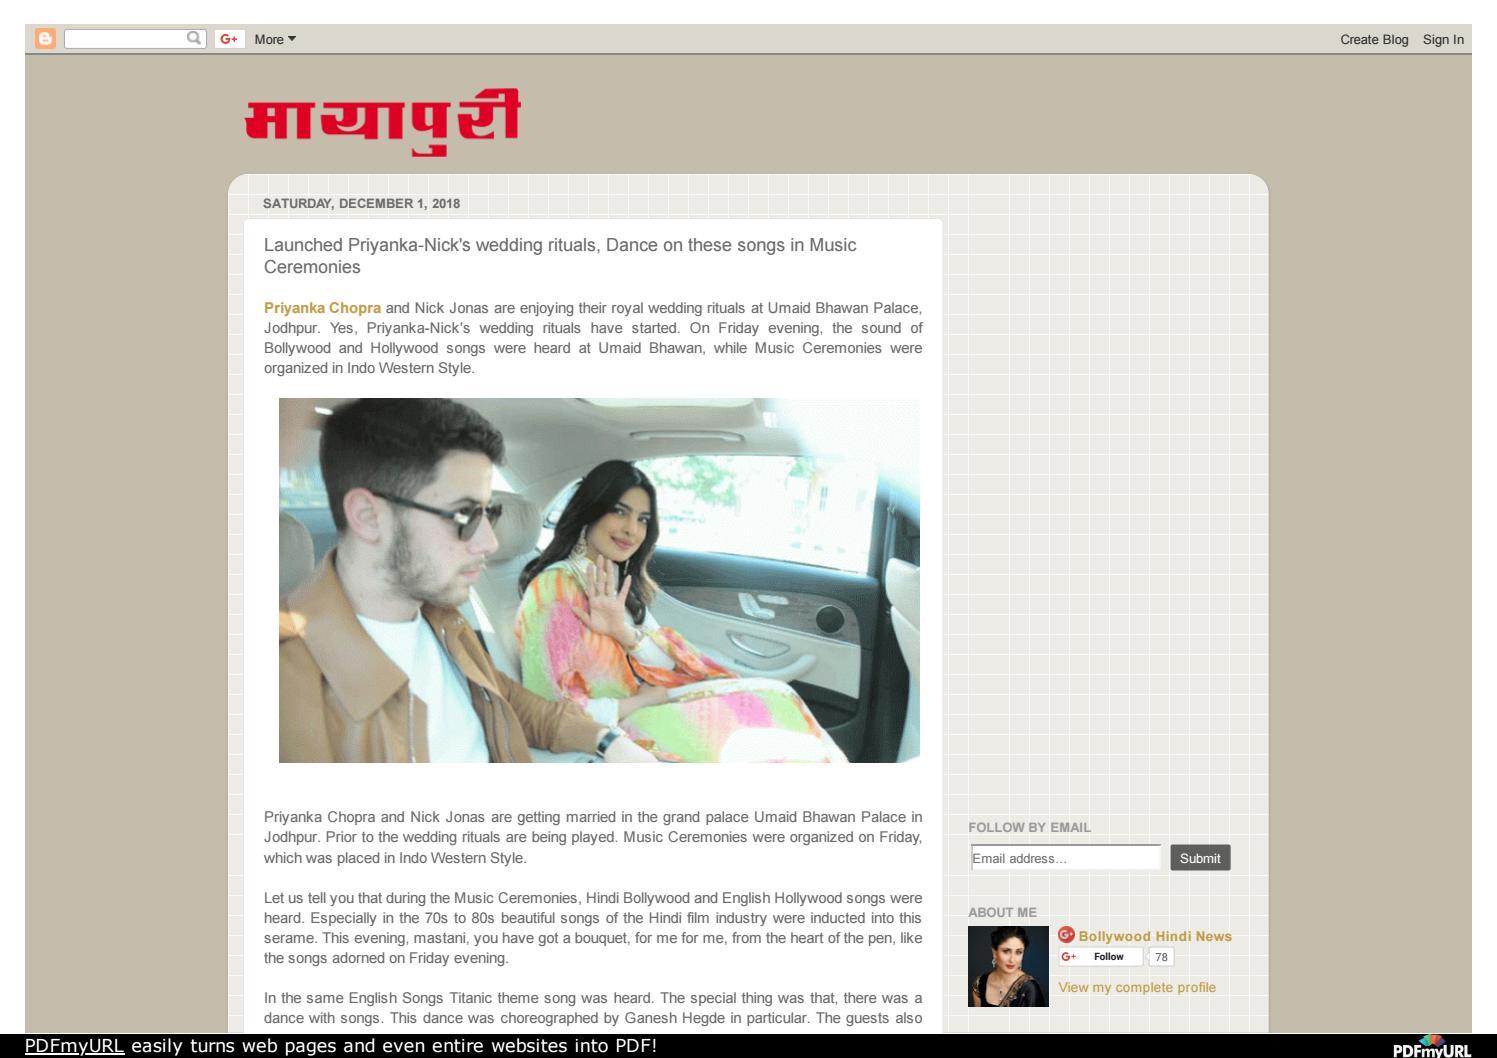 Launched Priyanka-Nick's wedding rituals, Dance on these